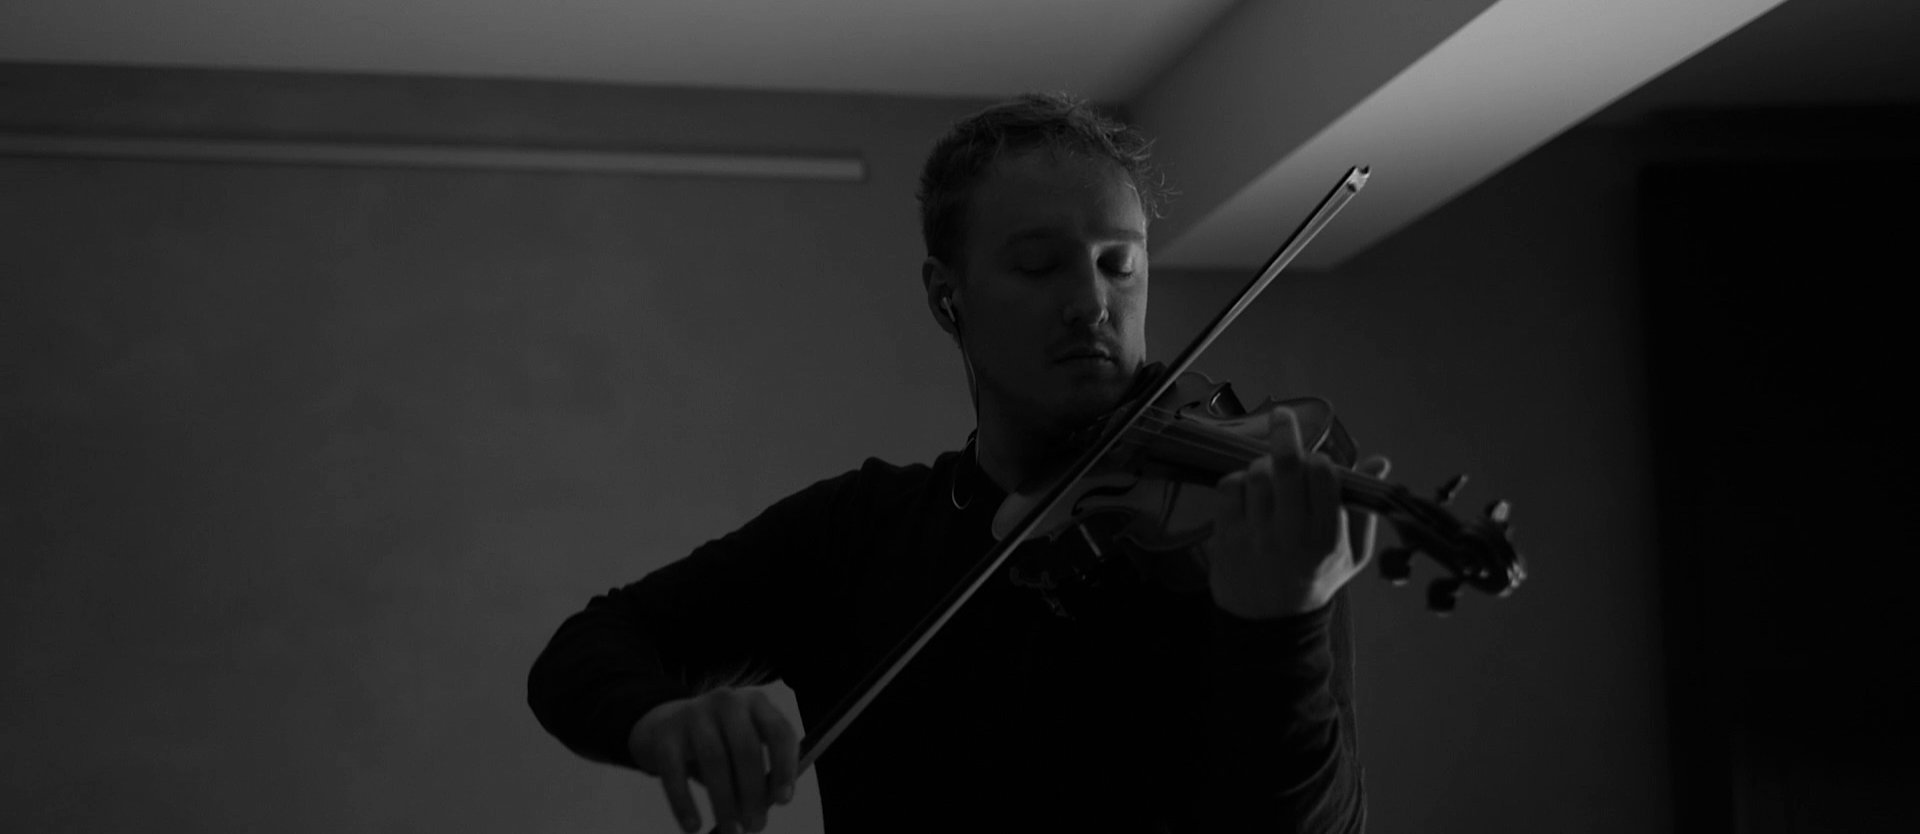 Daniel Pioro - Dust (live)